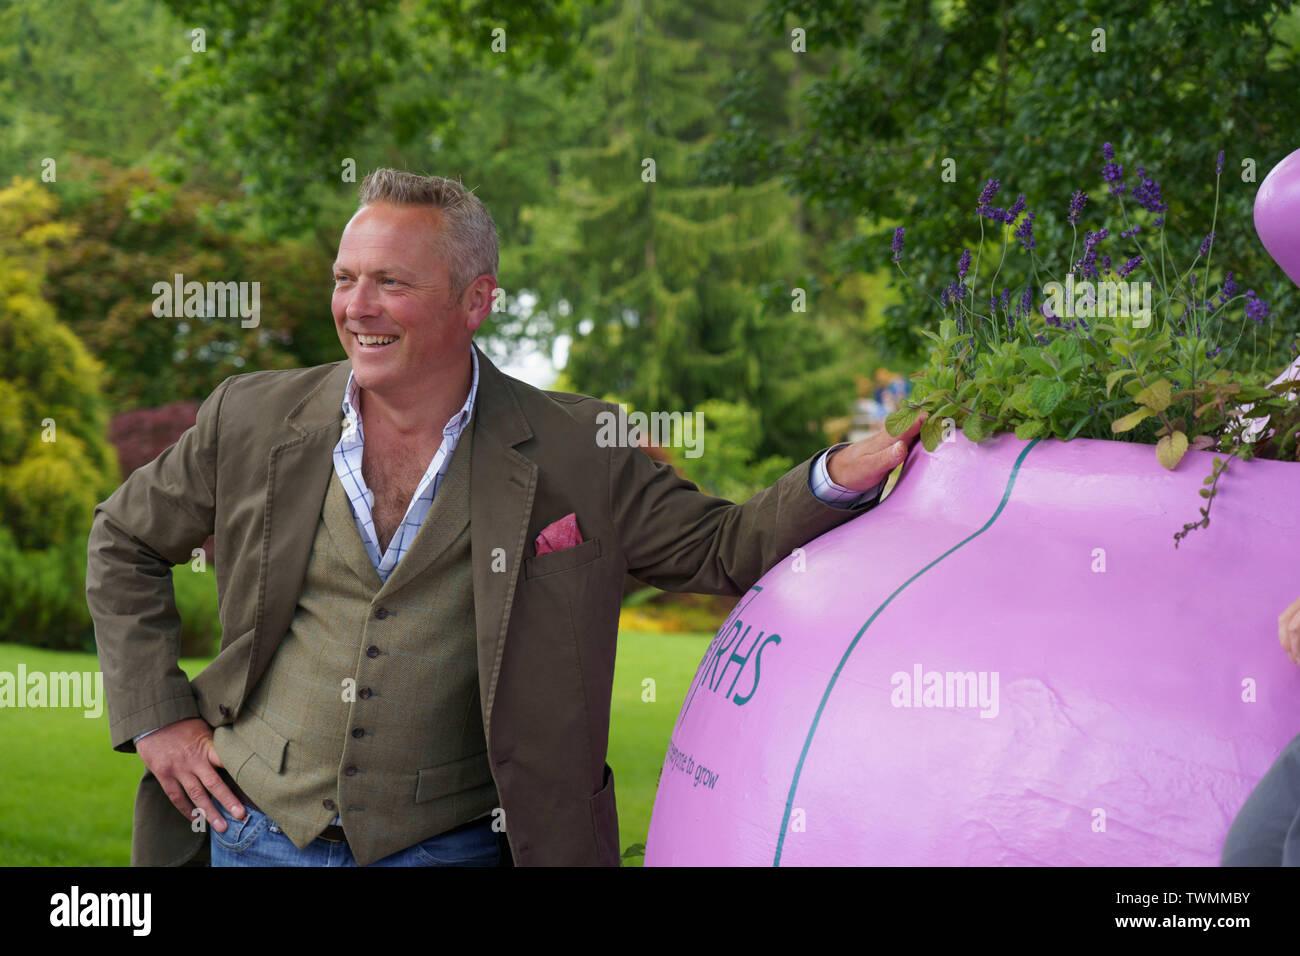 Julian Hudson TV Presenter posing for a photo at RHS Garden Harlow Carr summer flower show,Harrogate,North Yorkshire,England. - Stock Image